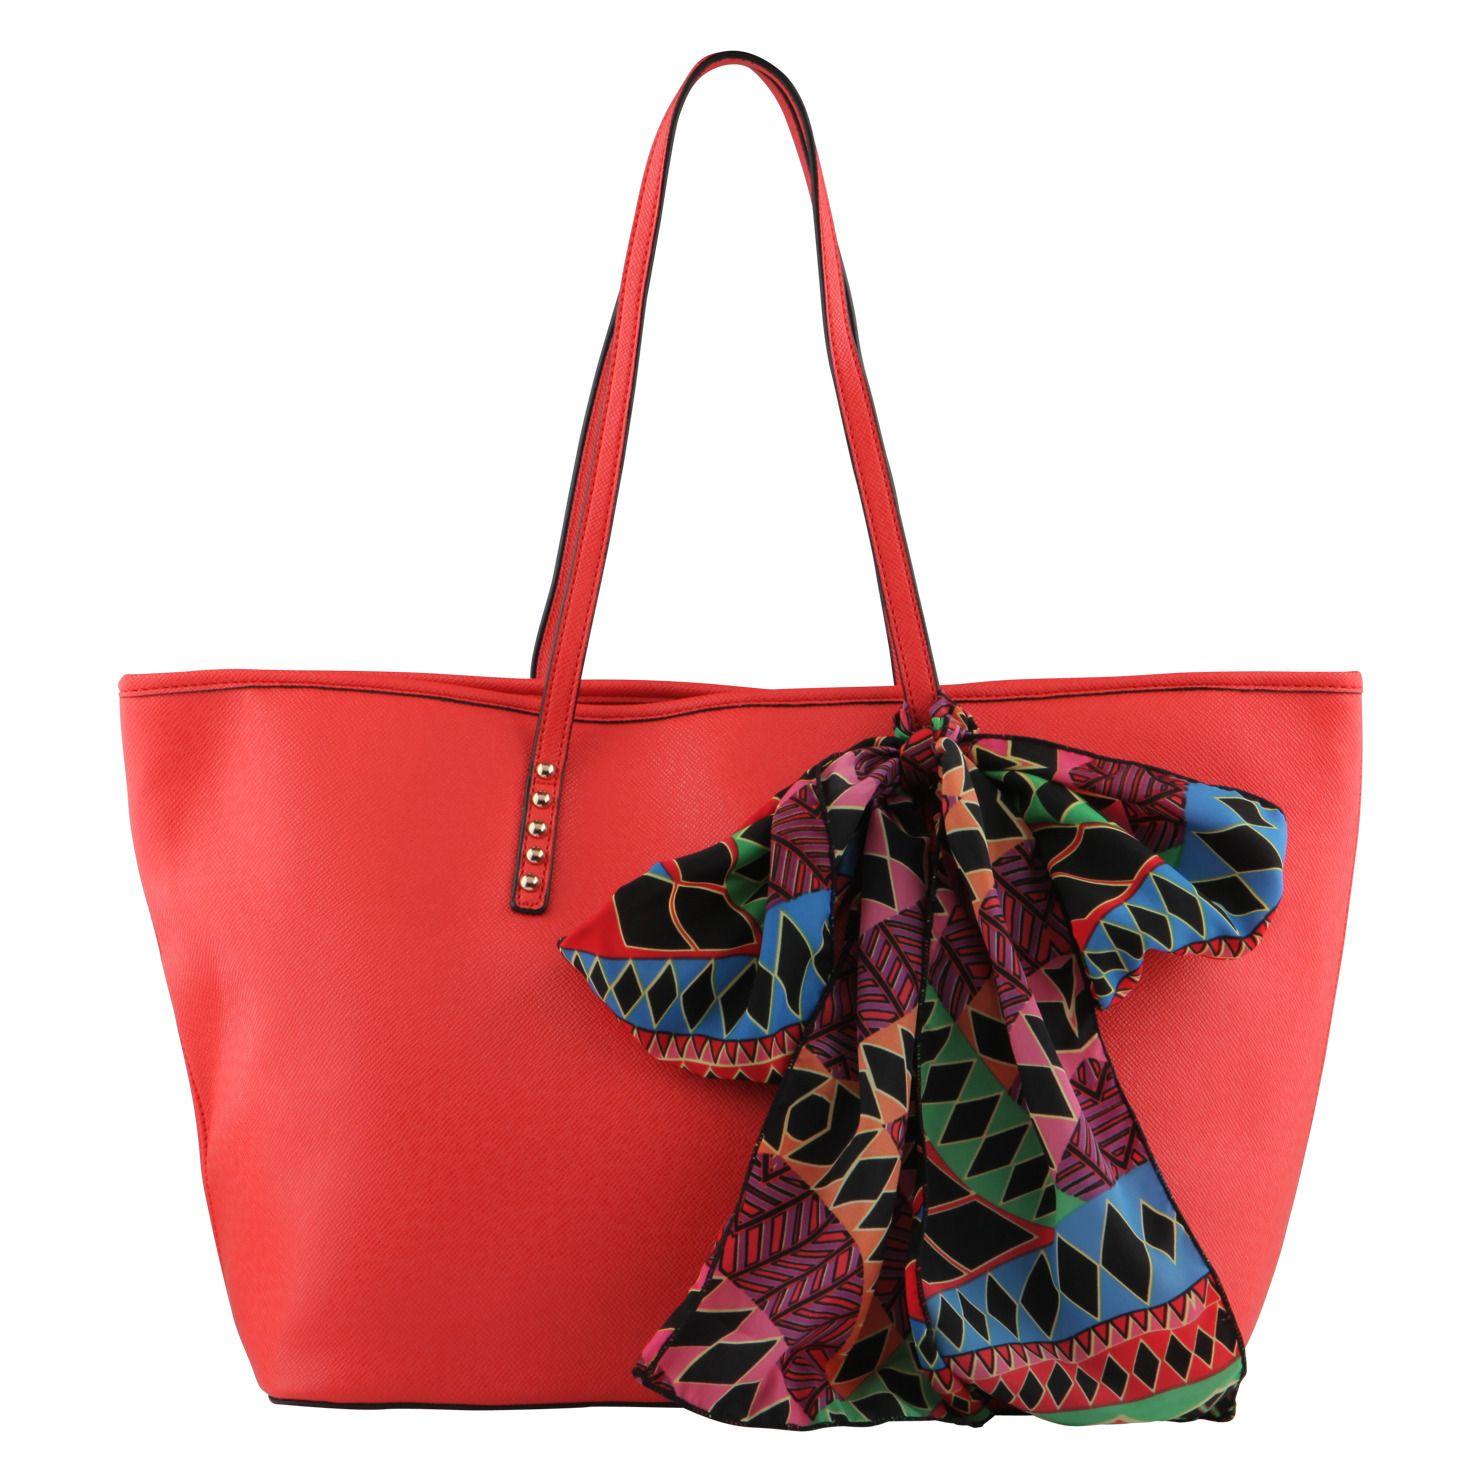 SEIDENBECKER - handbags's shoulder bags & totes for sale at ALDO ...